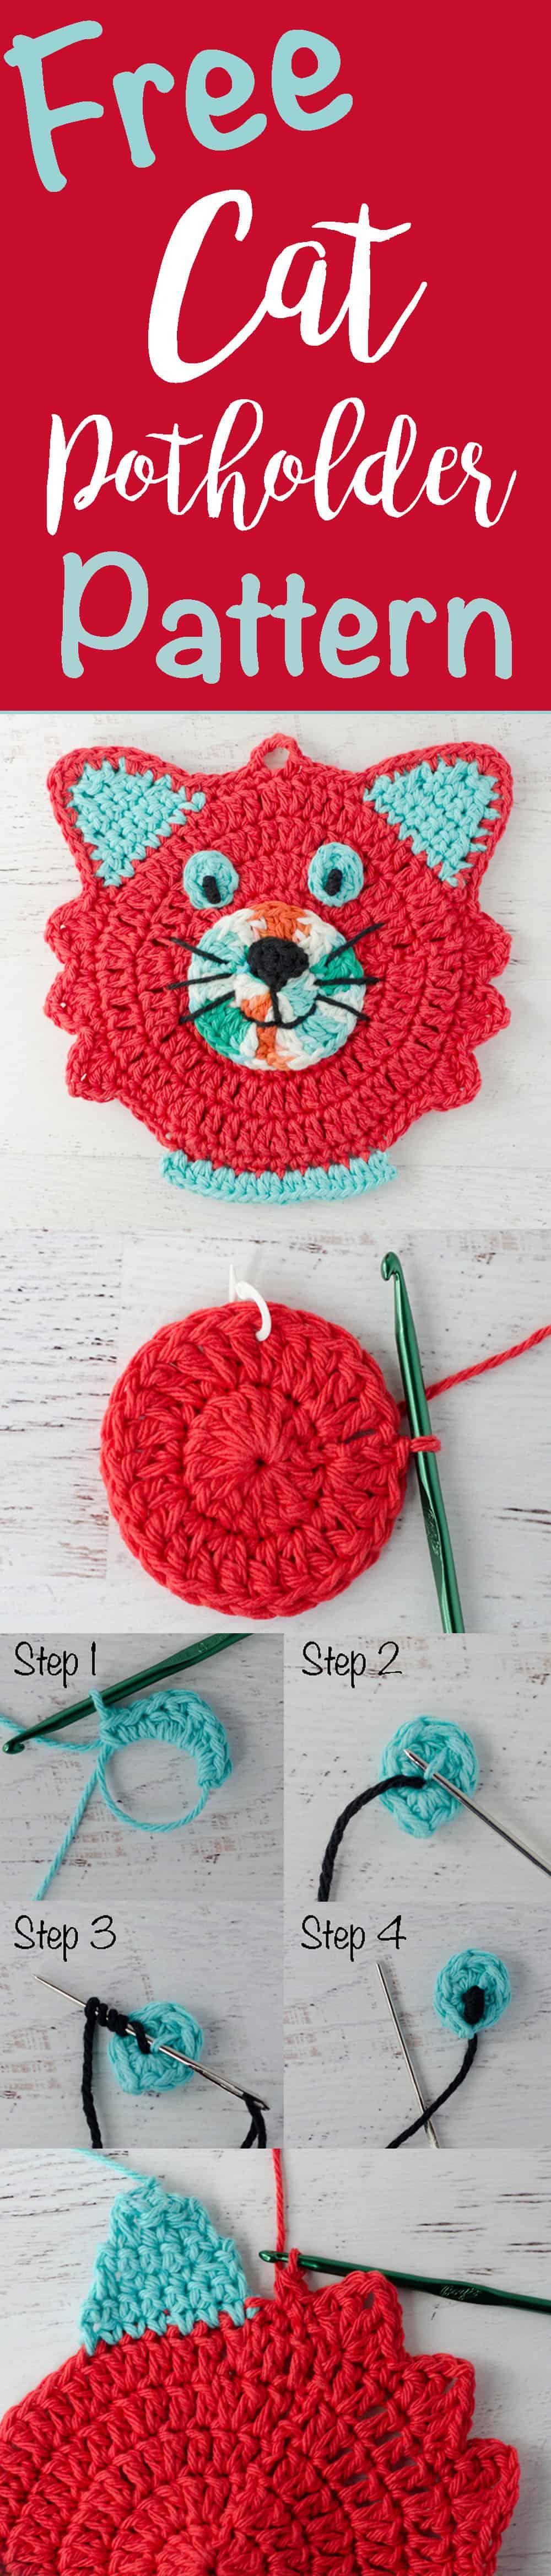 Crochet Cat Potholder Pattern - Crochet 365 Knit Too